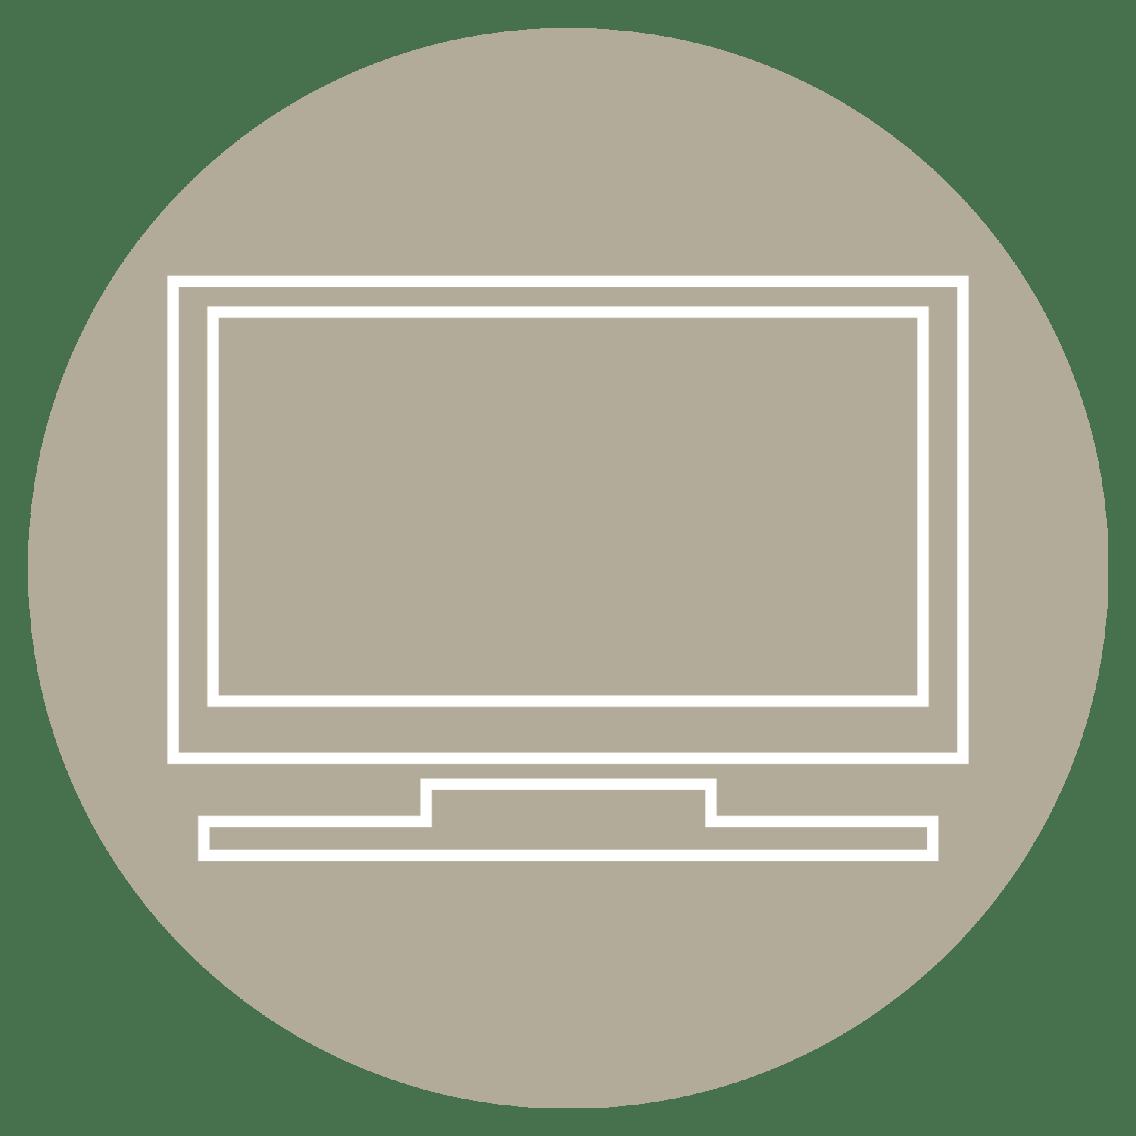 aya-kapadokya-room-features-amenities-icon-led-television